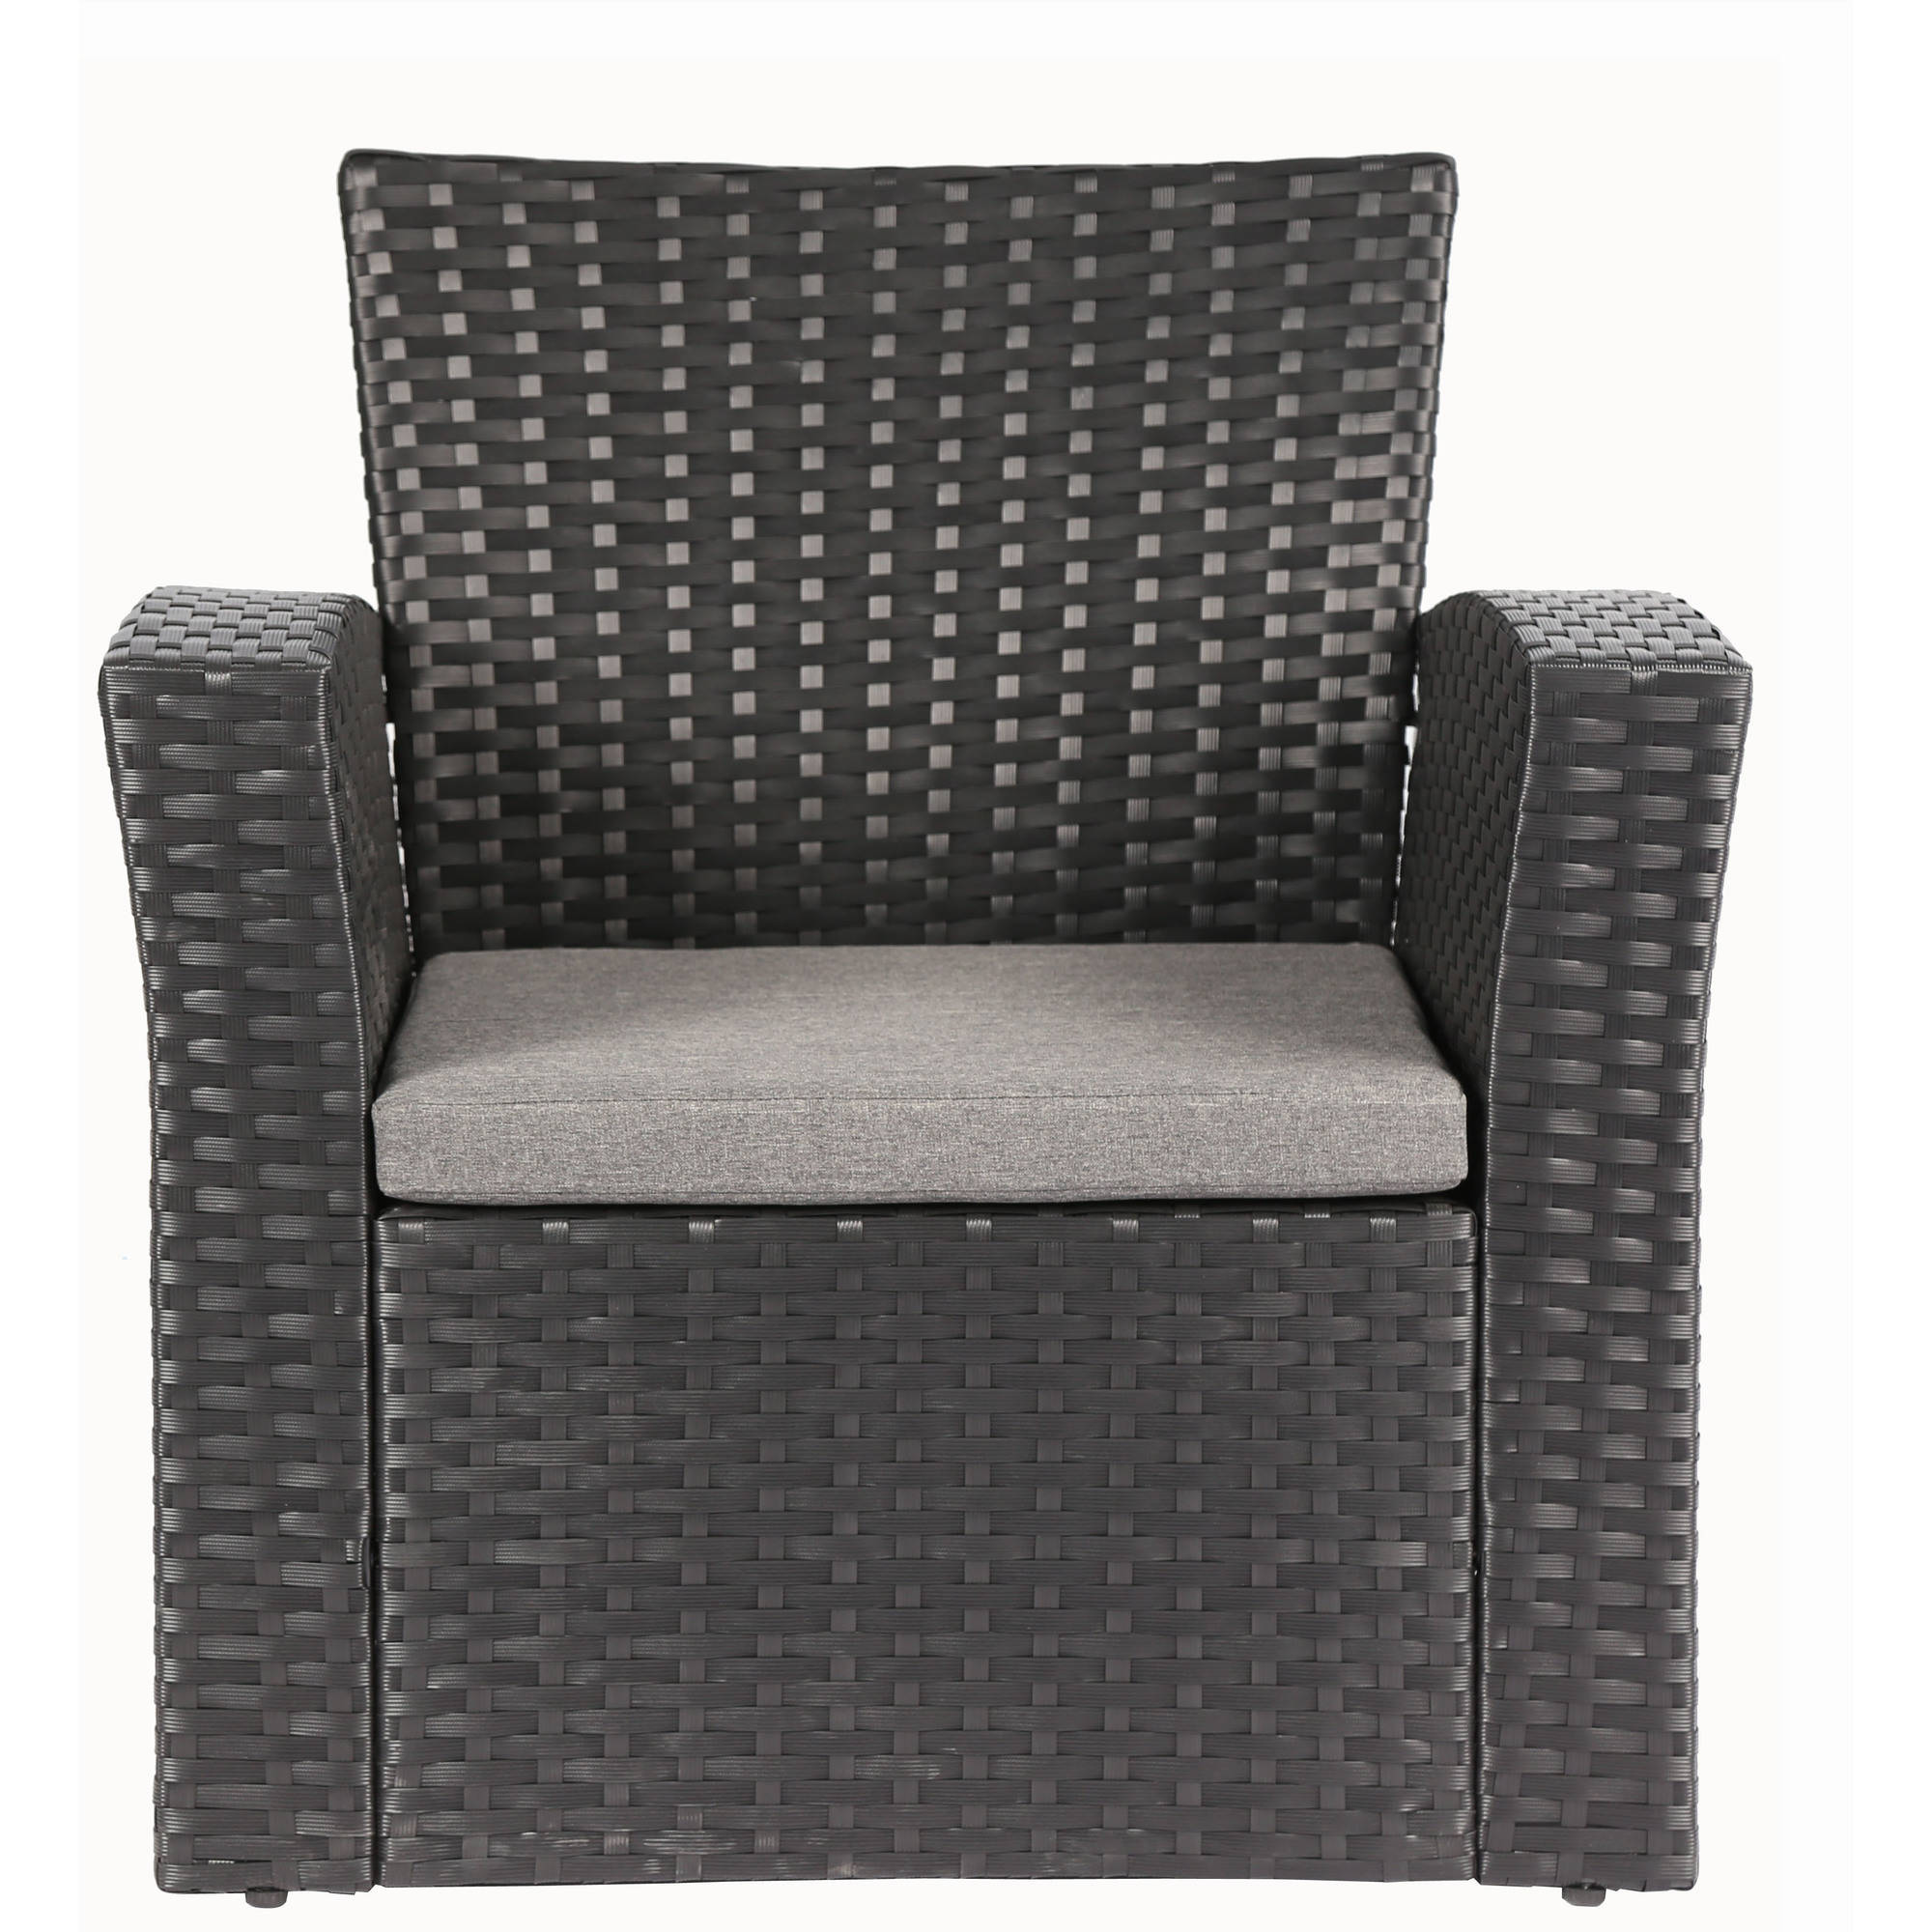 Rattan Garden Furniture Grey Cushions baner garden outdoor furniture complete patio wicker rattan garden